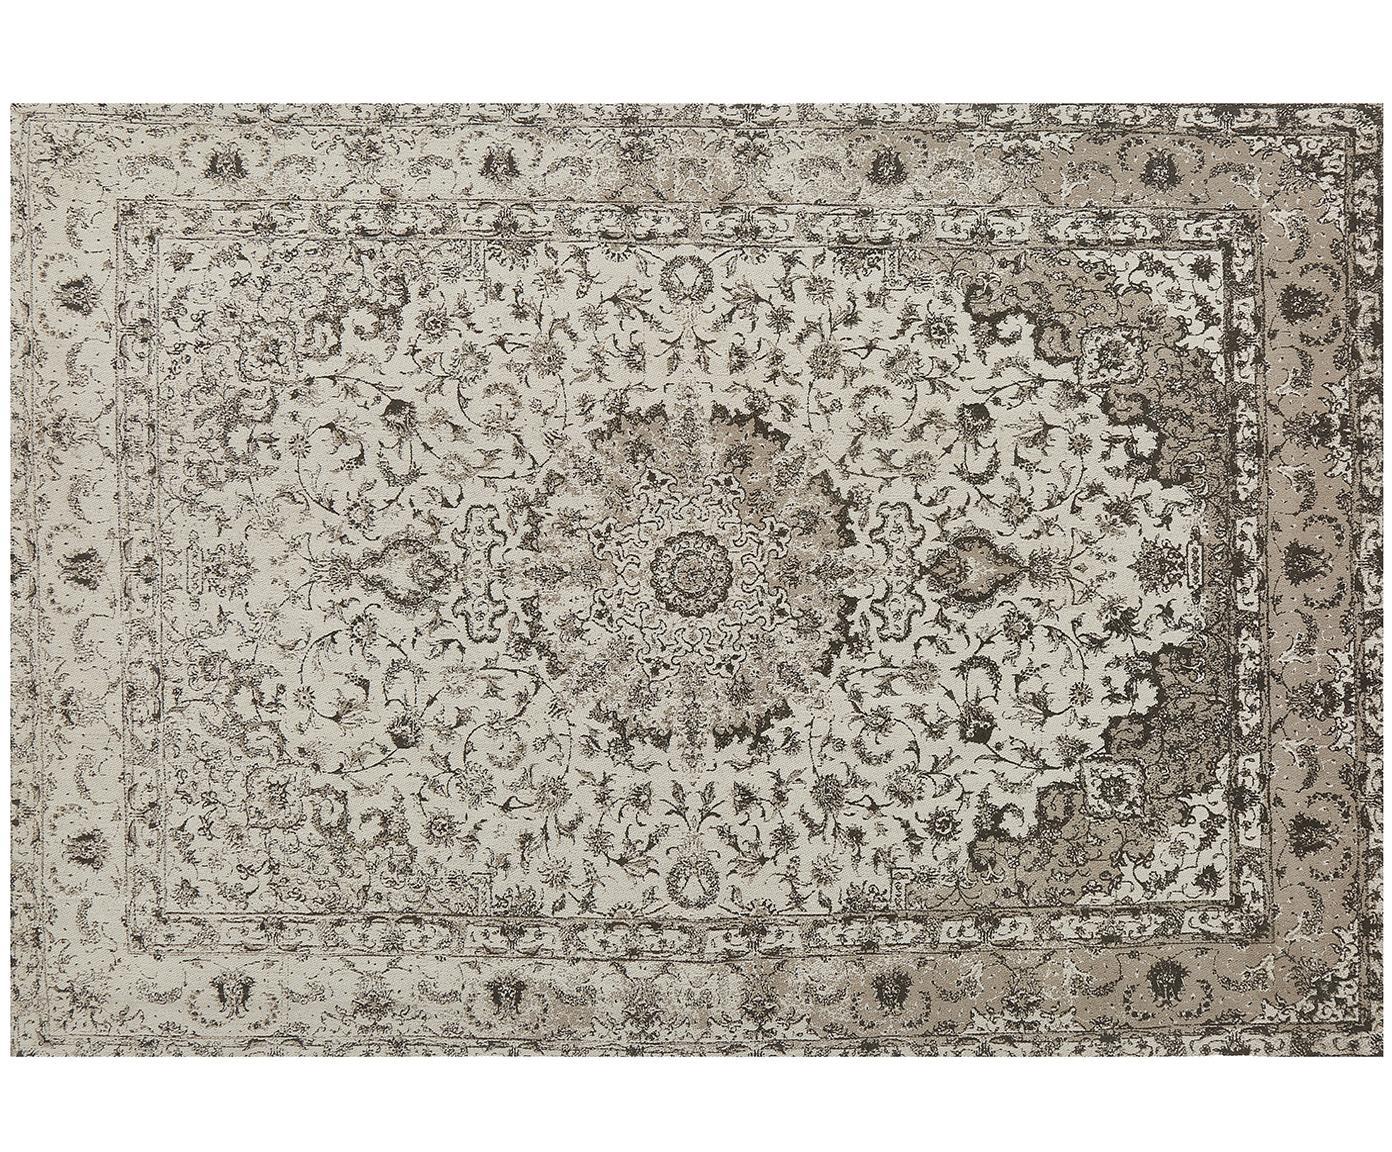 Alfombra artesanal de chenilla Sofia, estilo vintage, Parte superior: 95%algodón, 5%poliéster, Reverso: 100%algodón, Beige, gris, An 160 x L 230 cm (Tamaño M)